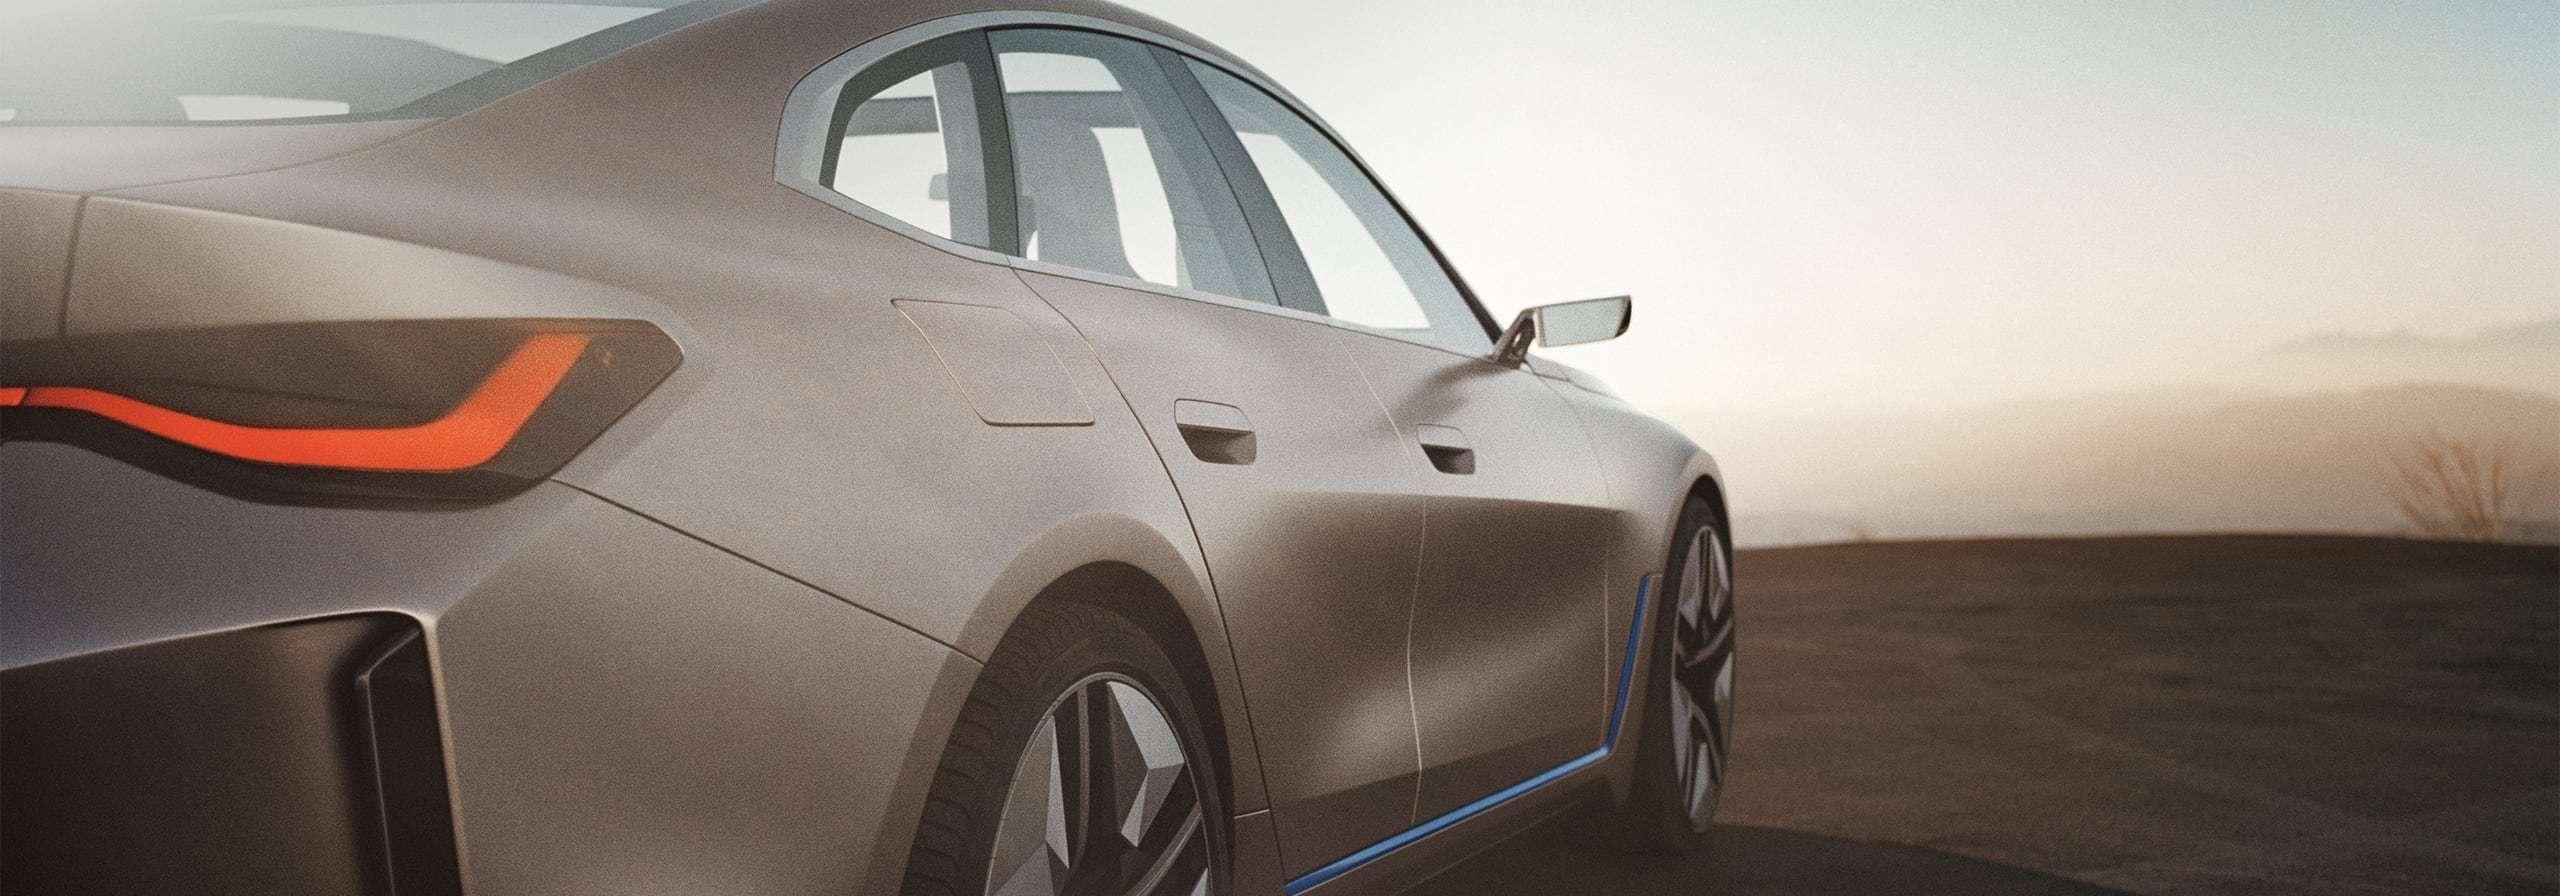 Three-quarter rear view of the BMW i4